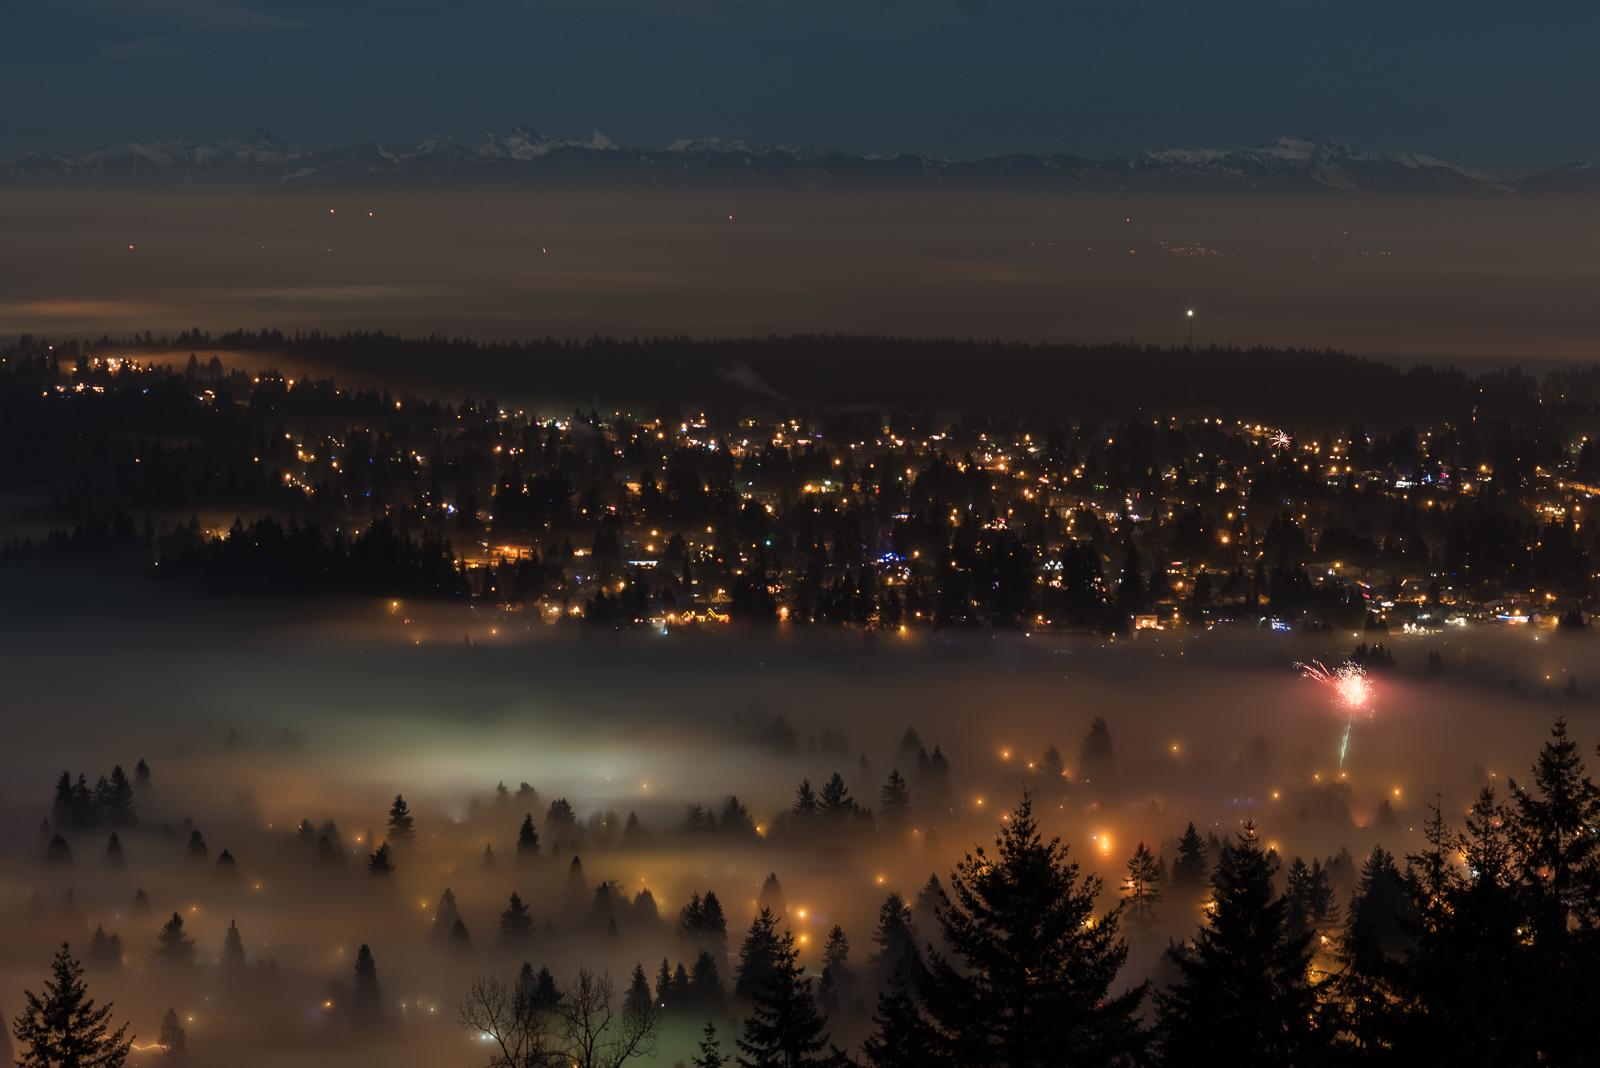 Fireworks over Coquitlam, BC, for New Years Eve 2018. Photo: Kristine Nyborg